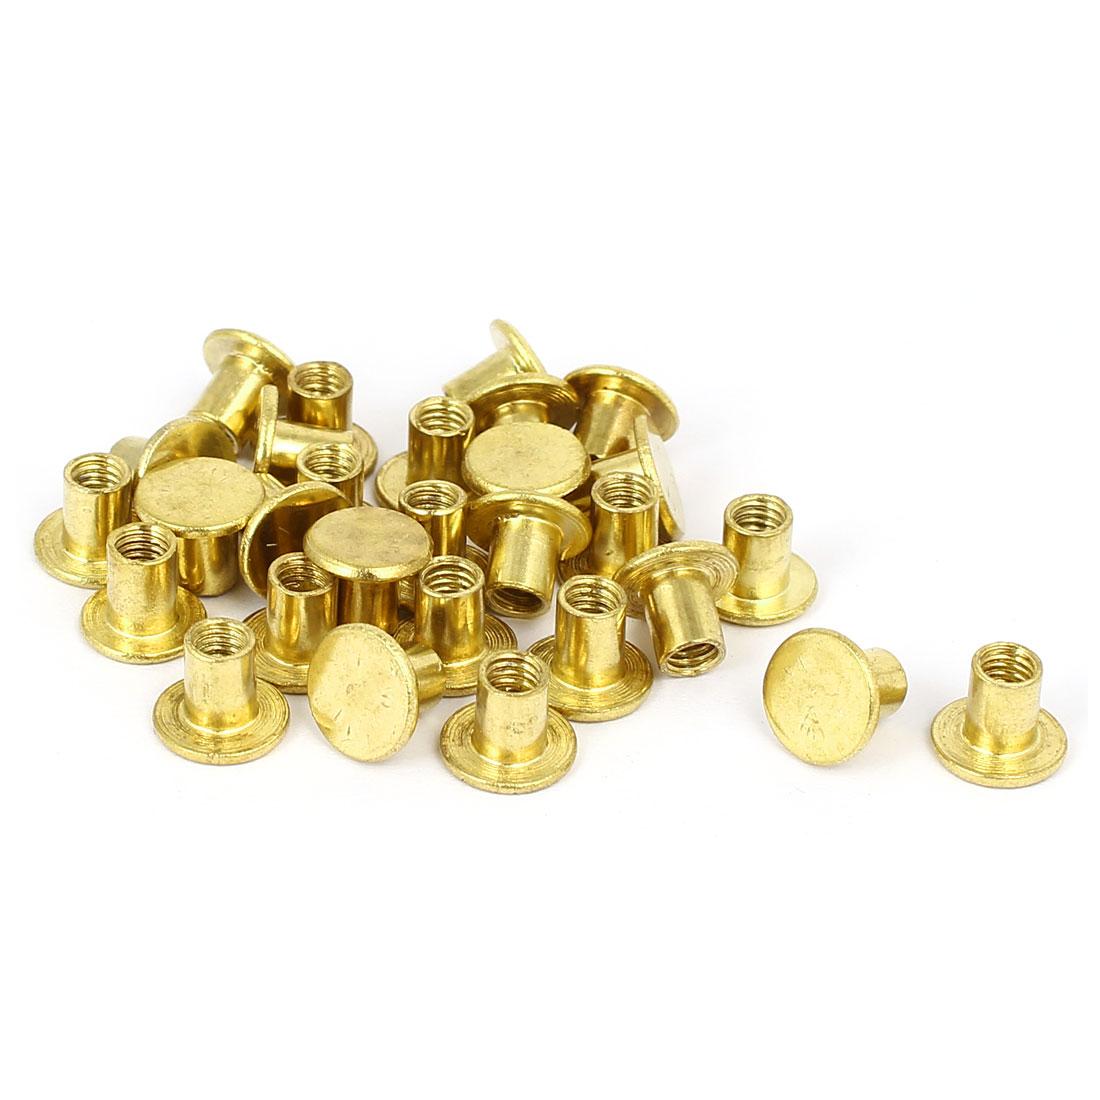 Photo Album Metal Brass Plated Binding Screw Post Barrel Nut 5mmx5.5mm 29pcs